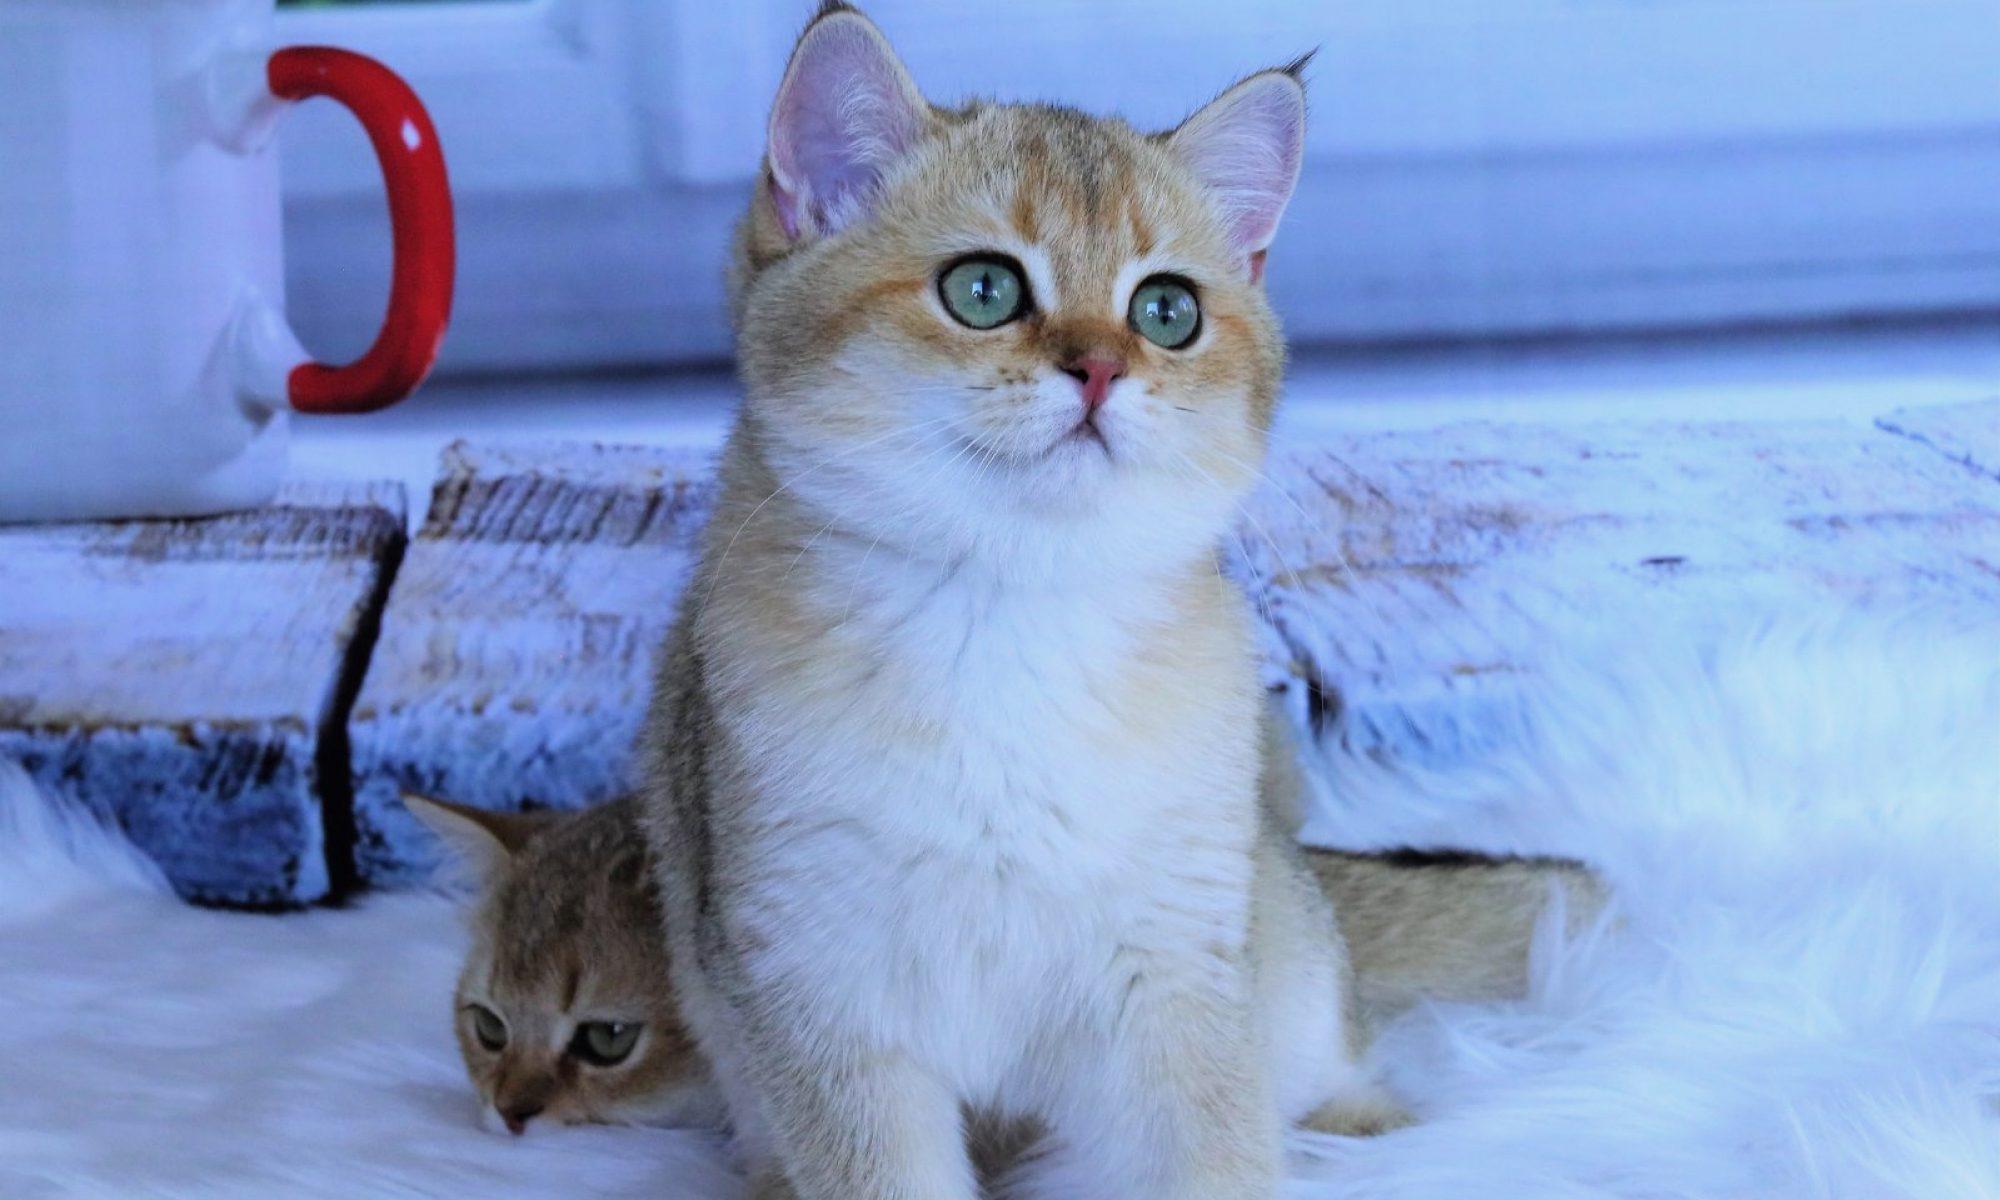 NW British Cat Cattery